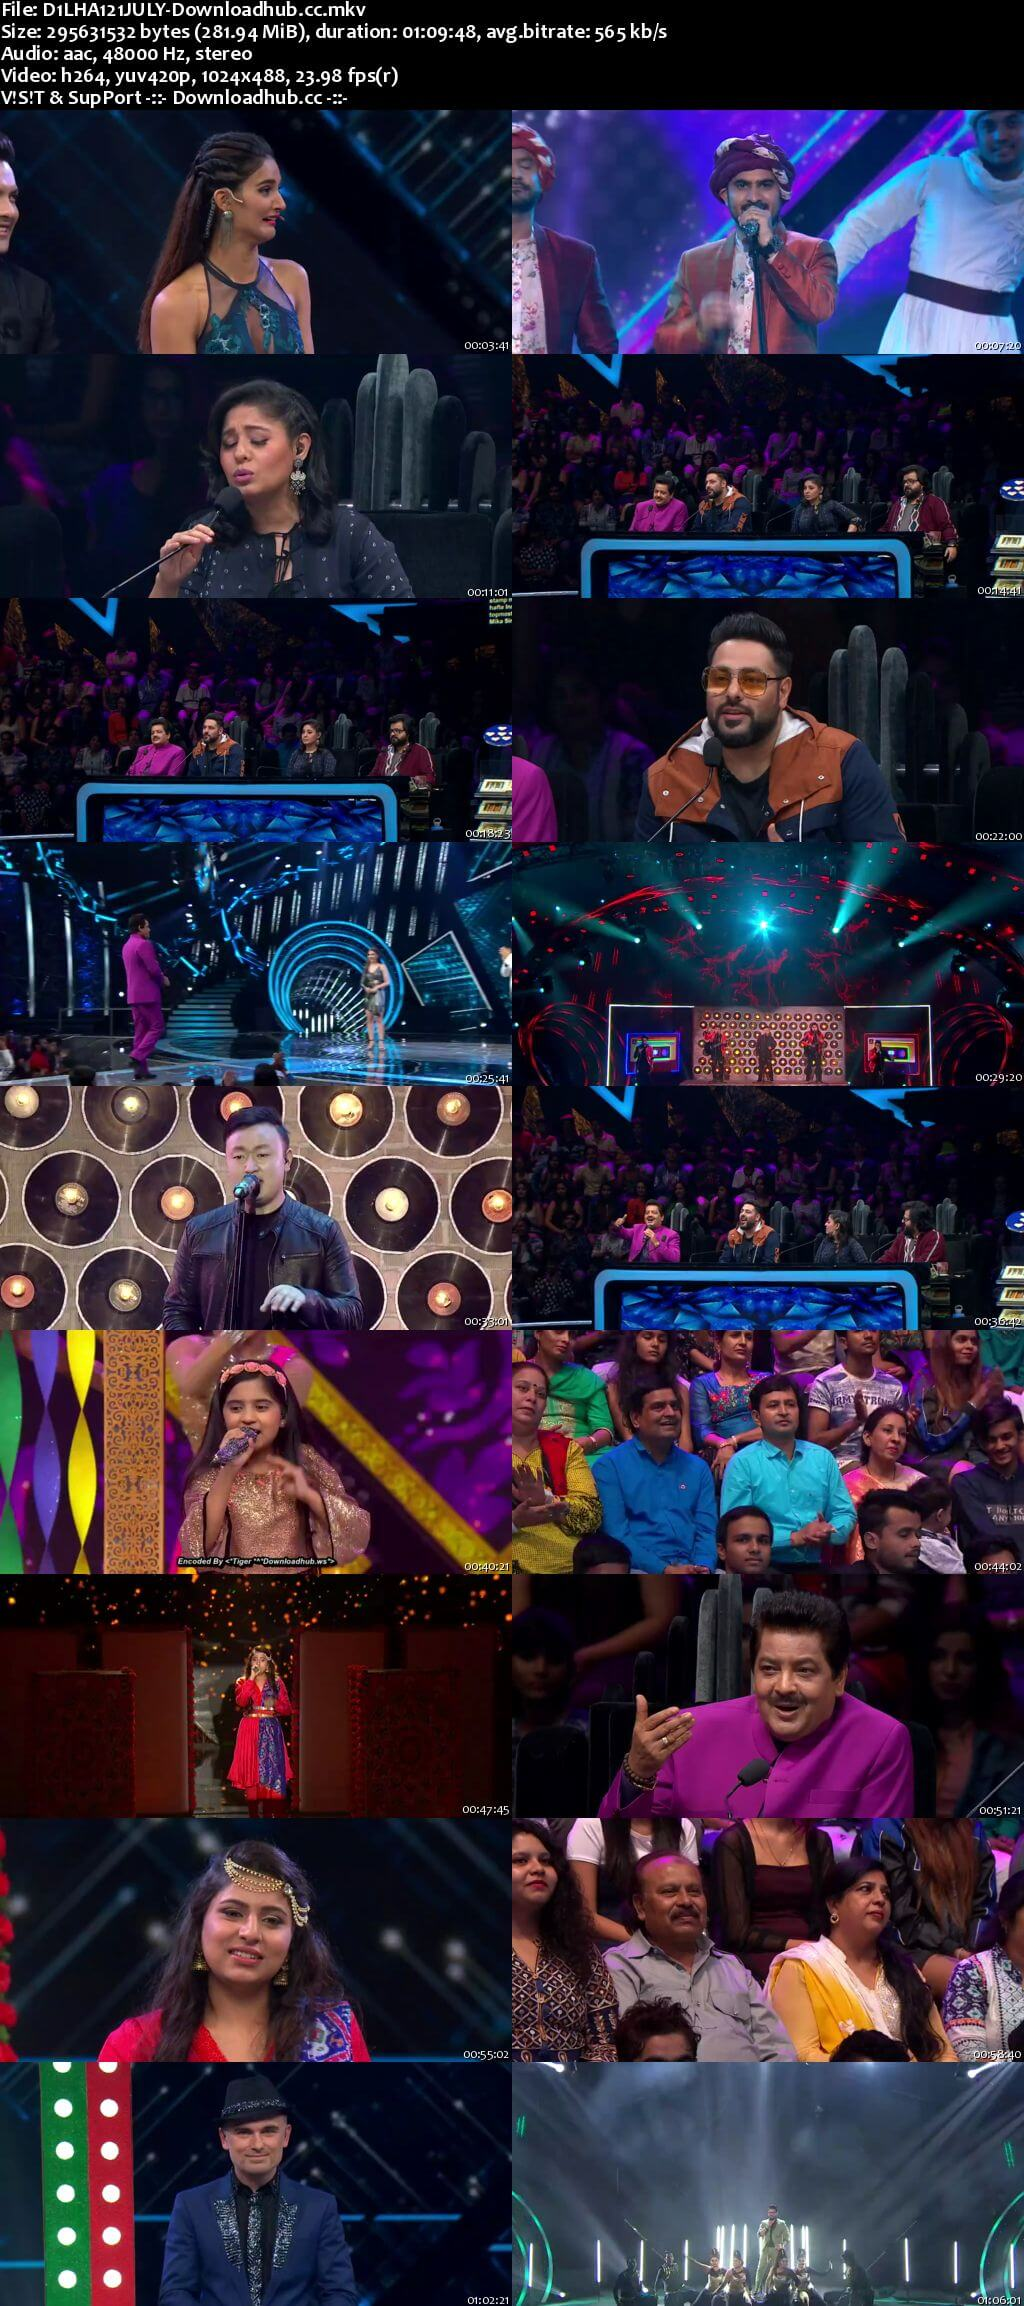 Dil Hai Hindustani 2 21 July 2018 Episode 05 HDTV 480p